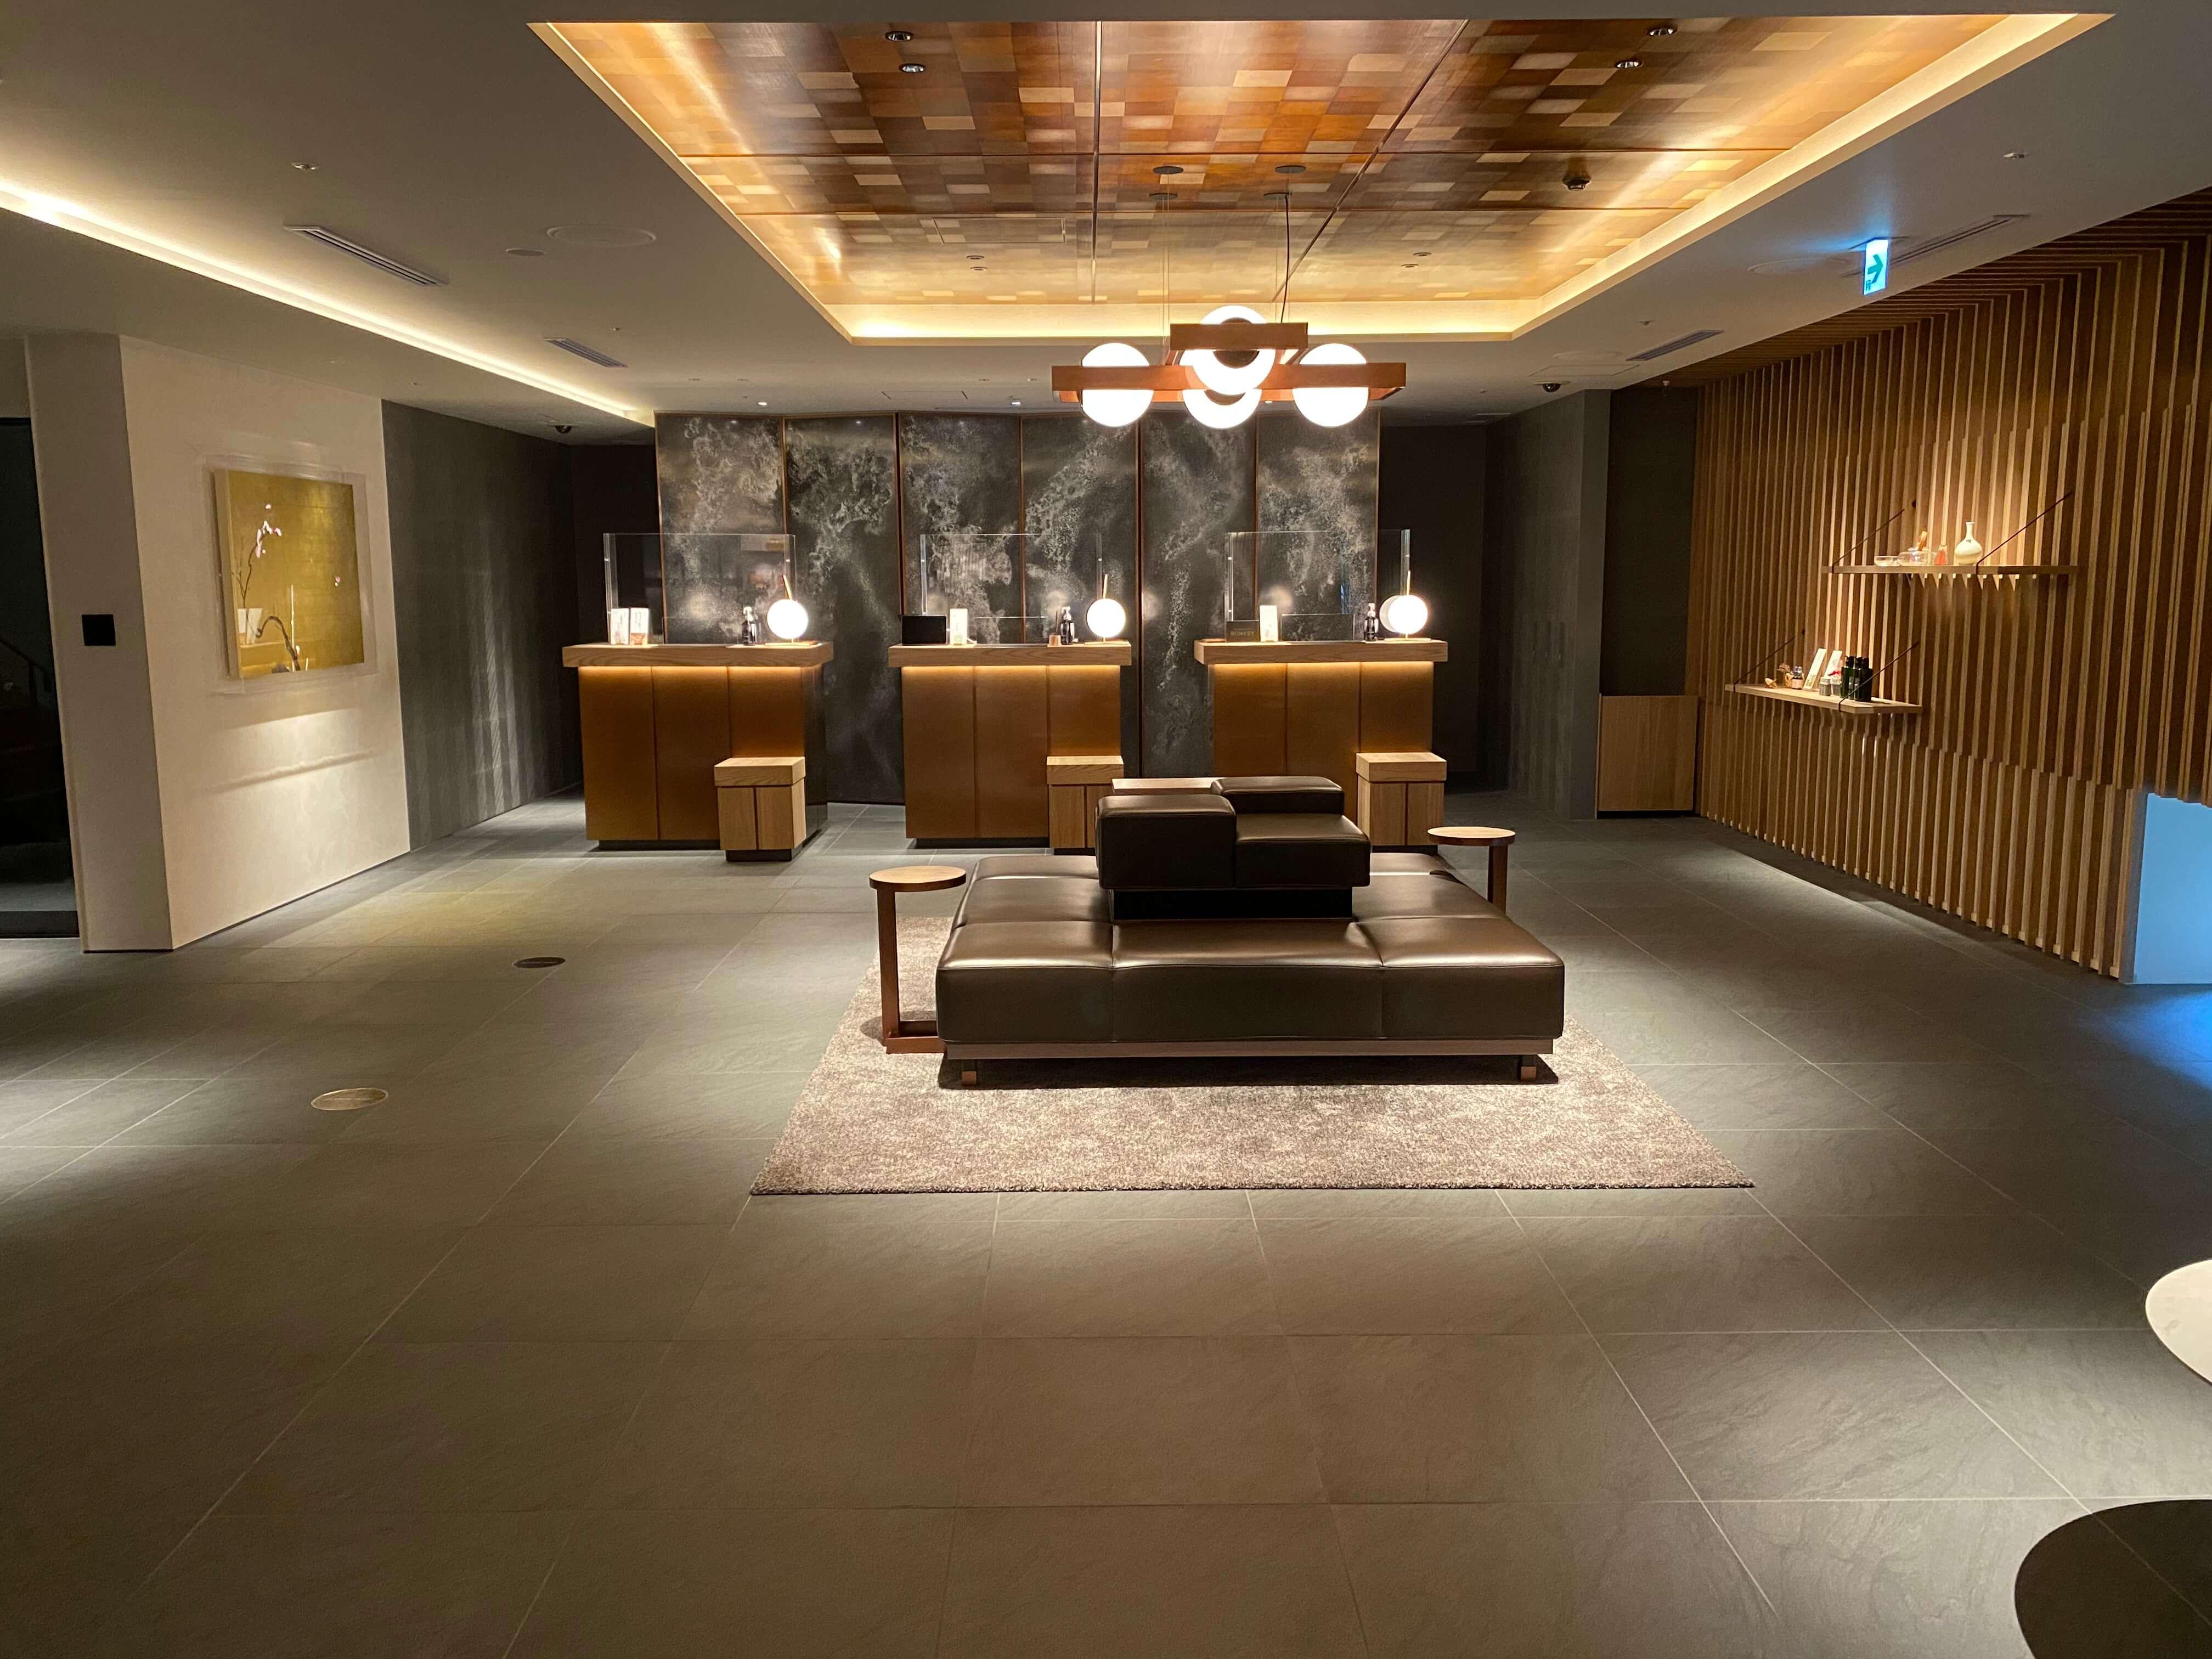 HIYORIチャプター京都 トリビュートポートフォリオホテル フロント